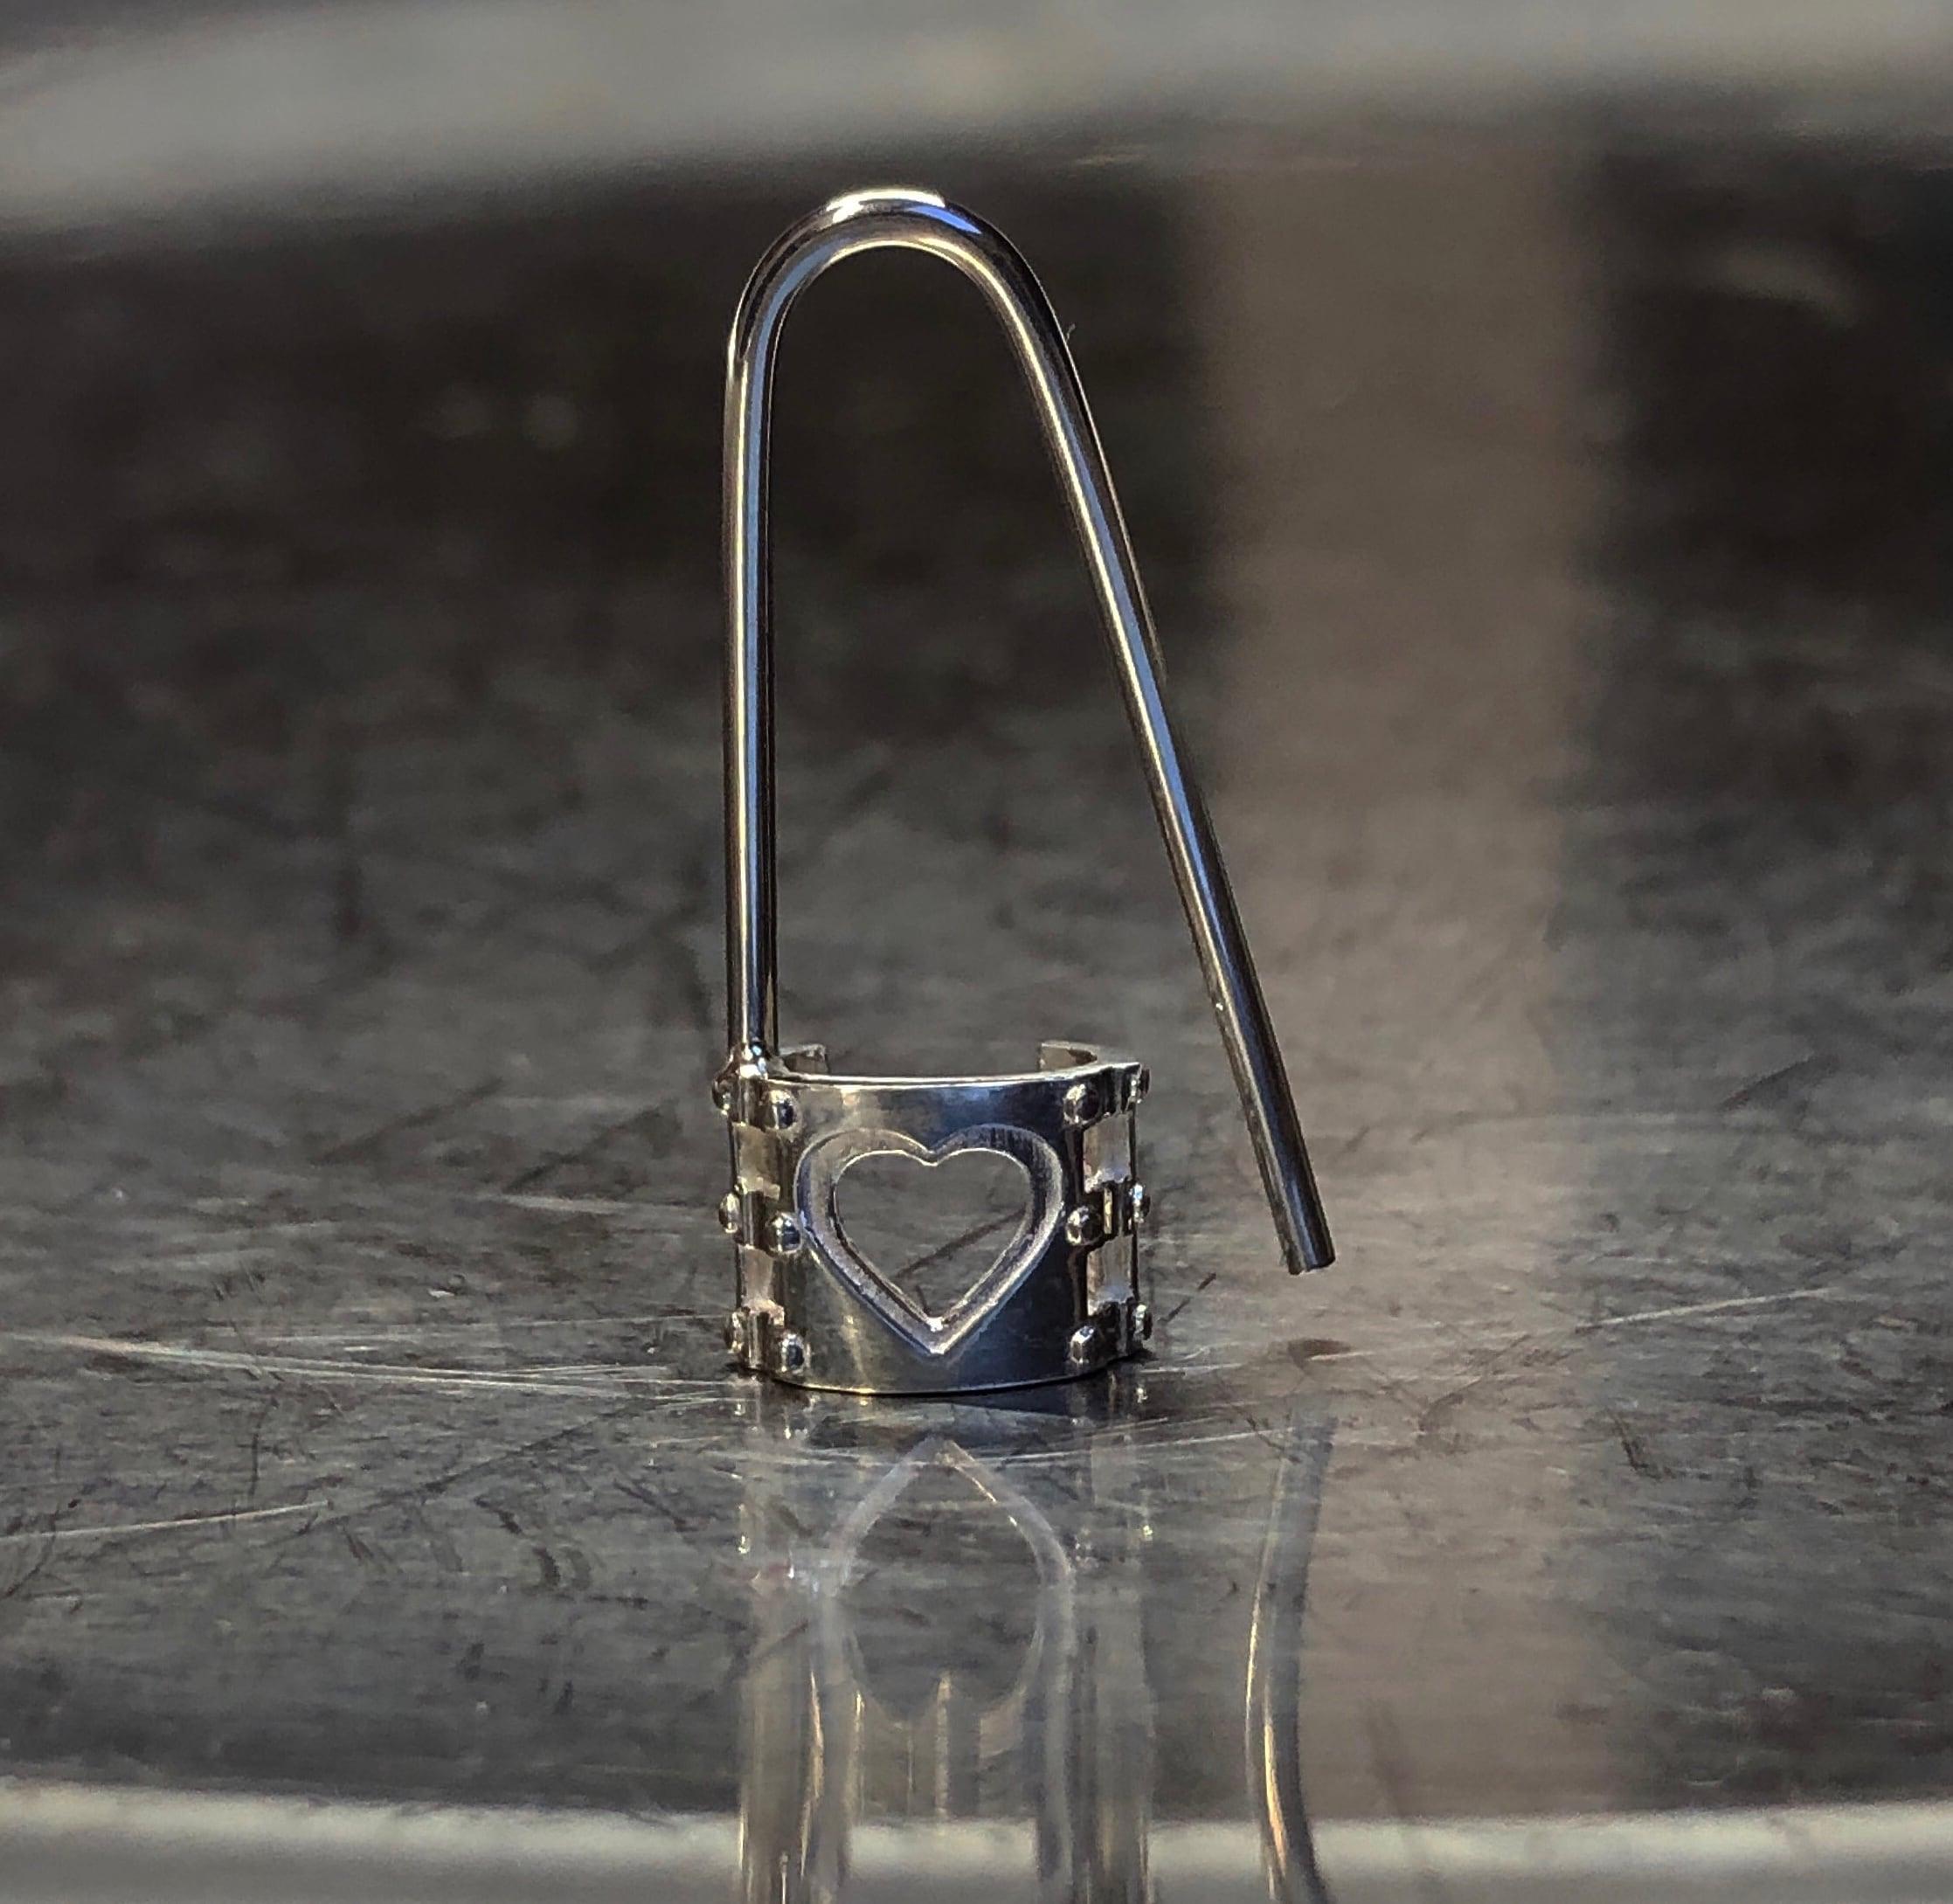 handcuffs pin earring SILVER925/16G  #LJ18020P 手枷 ピン ピアス シルバー925/16G